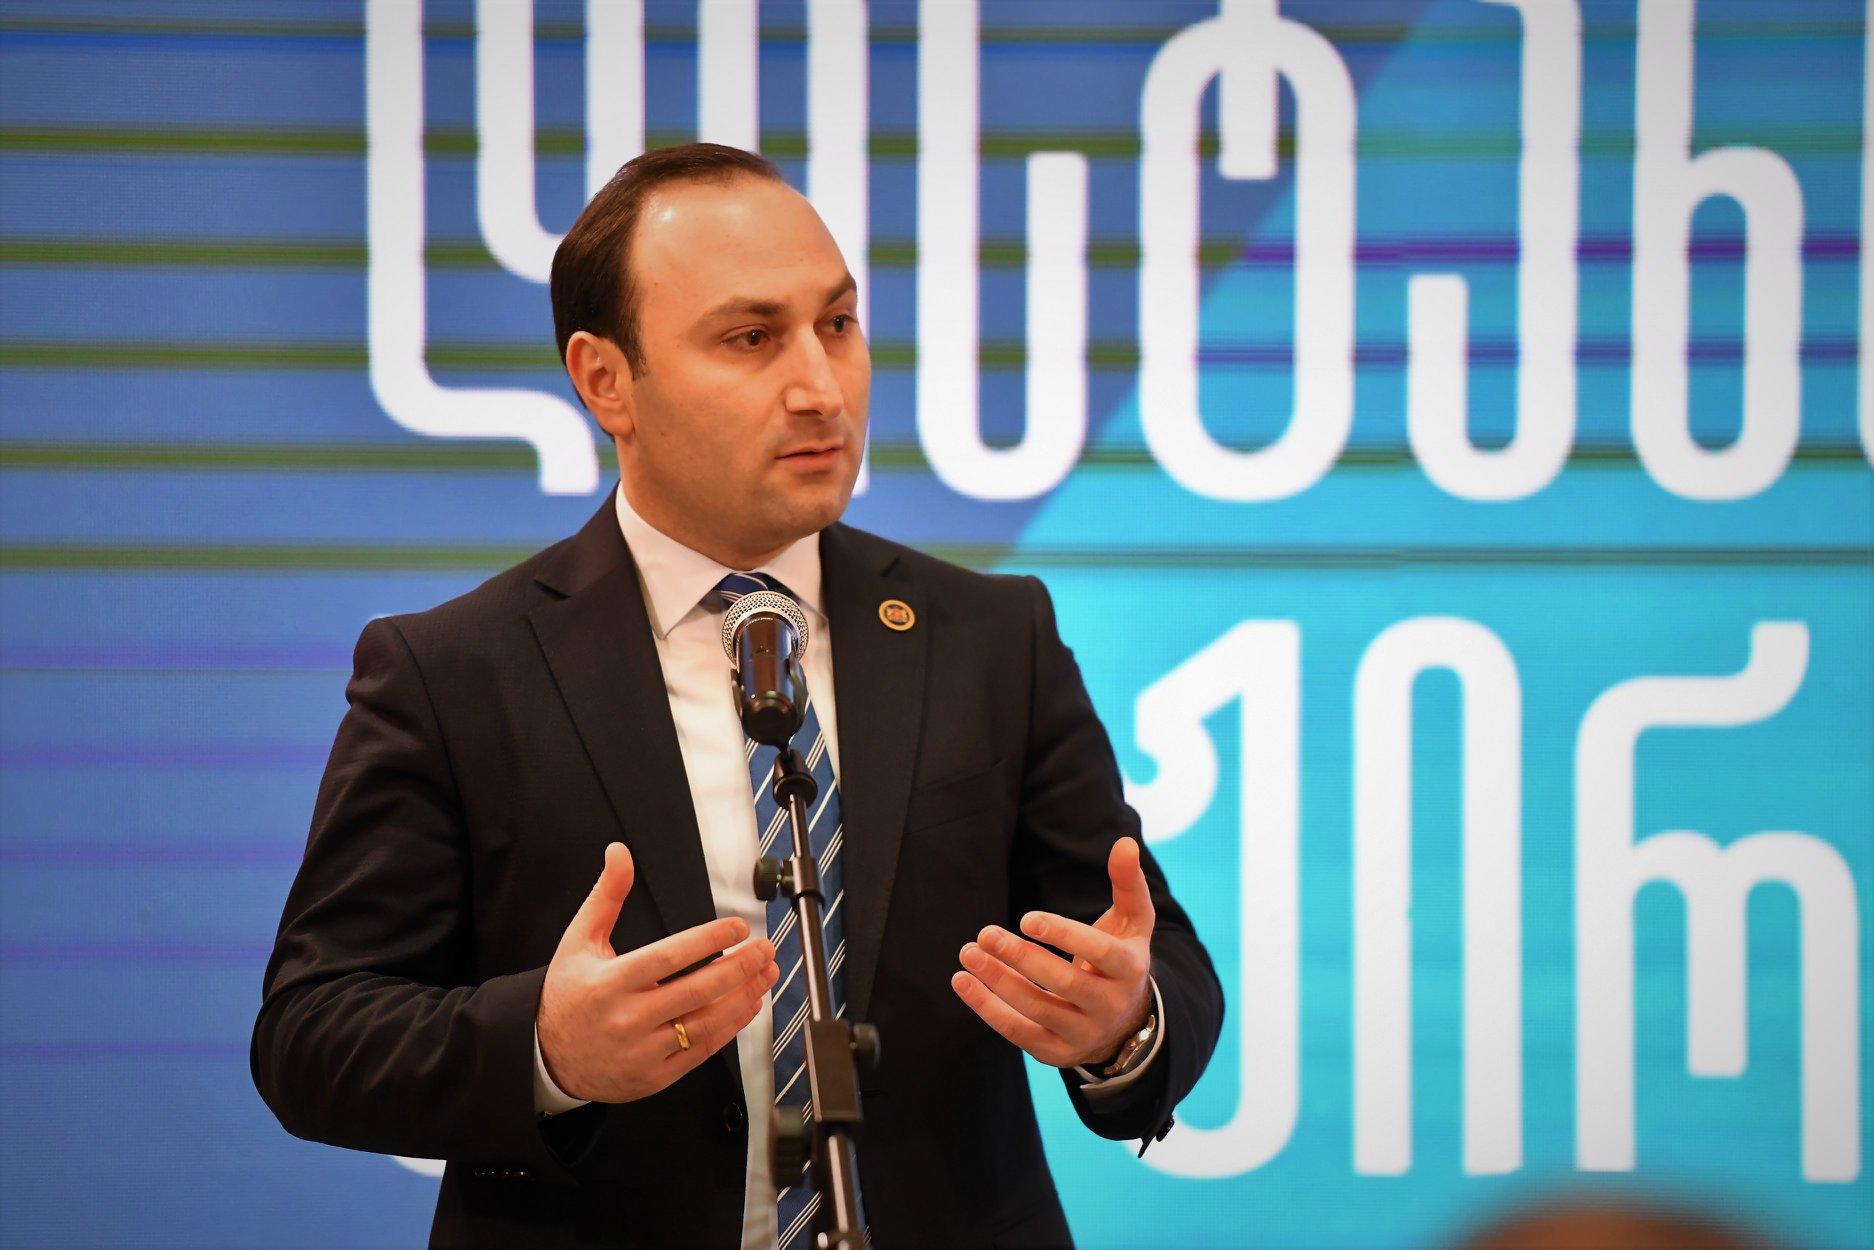 Anri Okhanashvili 1 Инга Григолия Инга Григолия